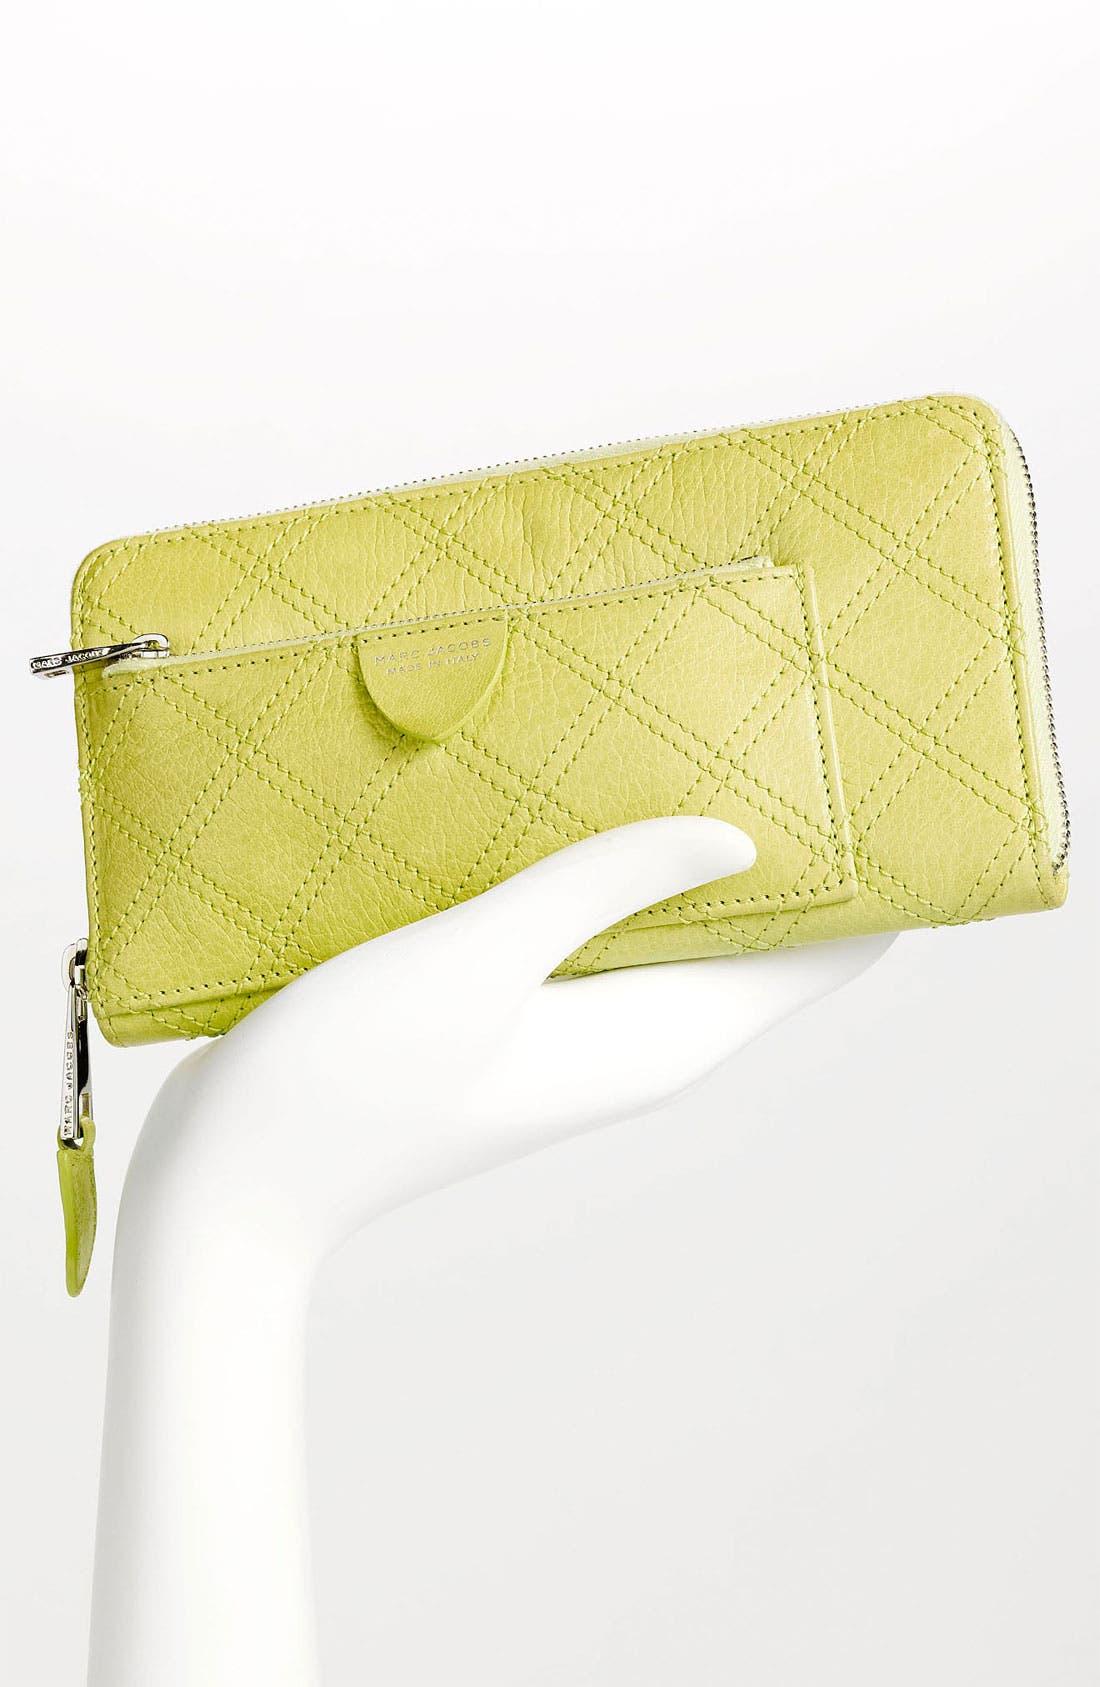 Alternate Image 2  - MARC JACOBS 'Sister' Leather Wallet